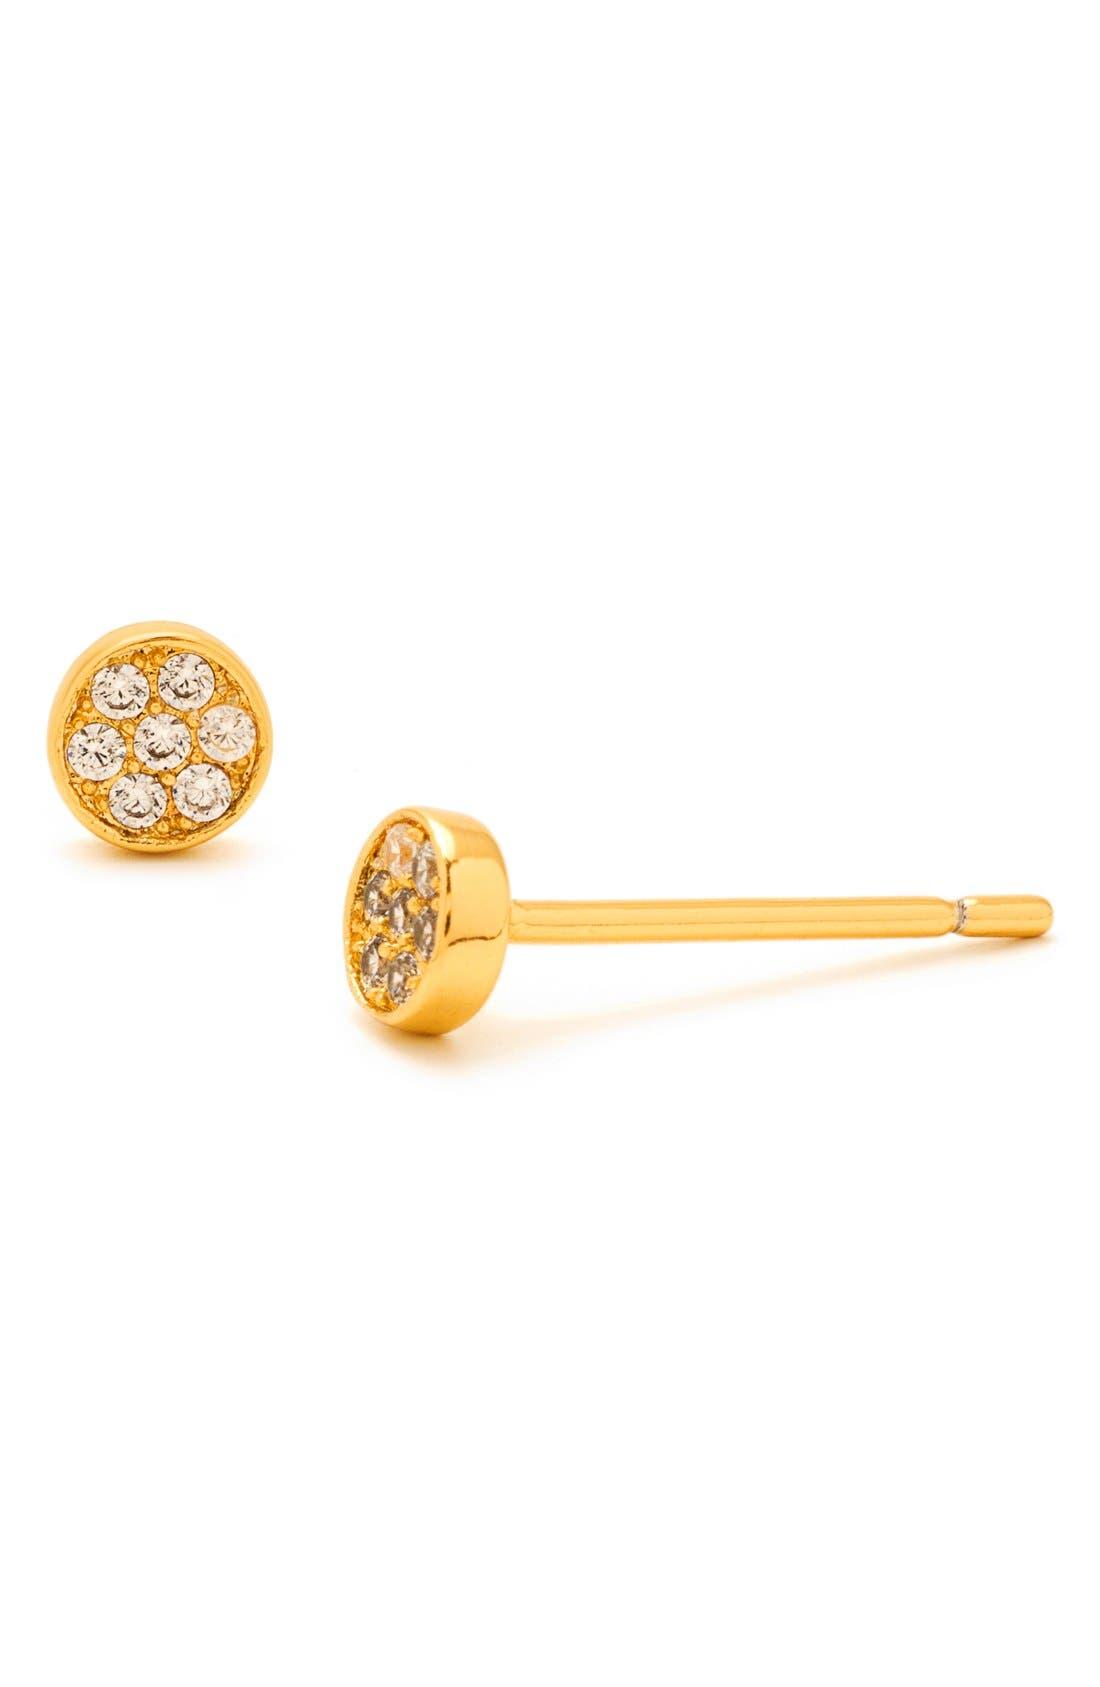 GORJANA Pristine Cubic Zirconia Stud Earrings